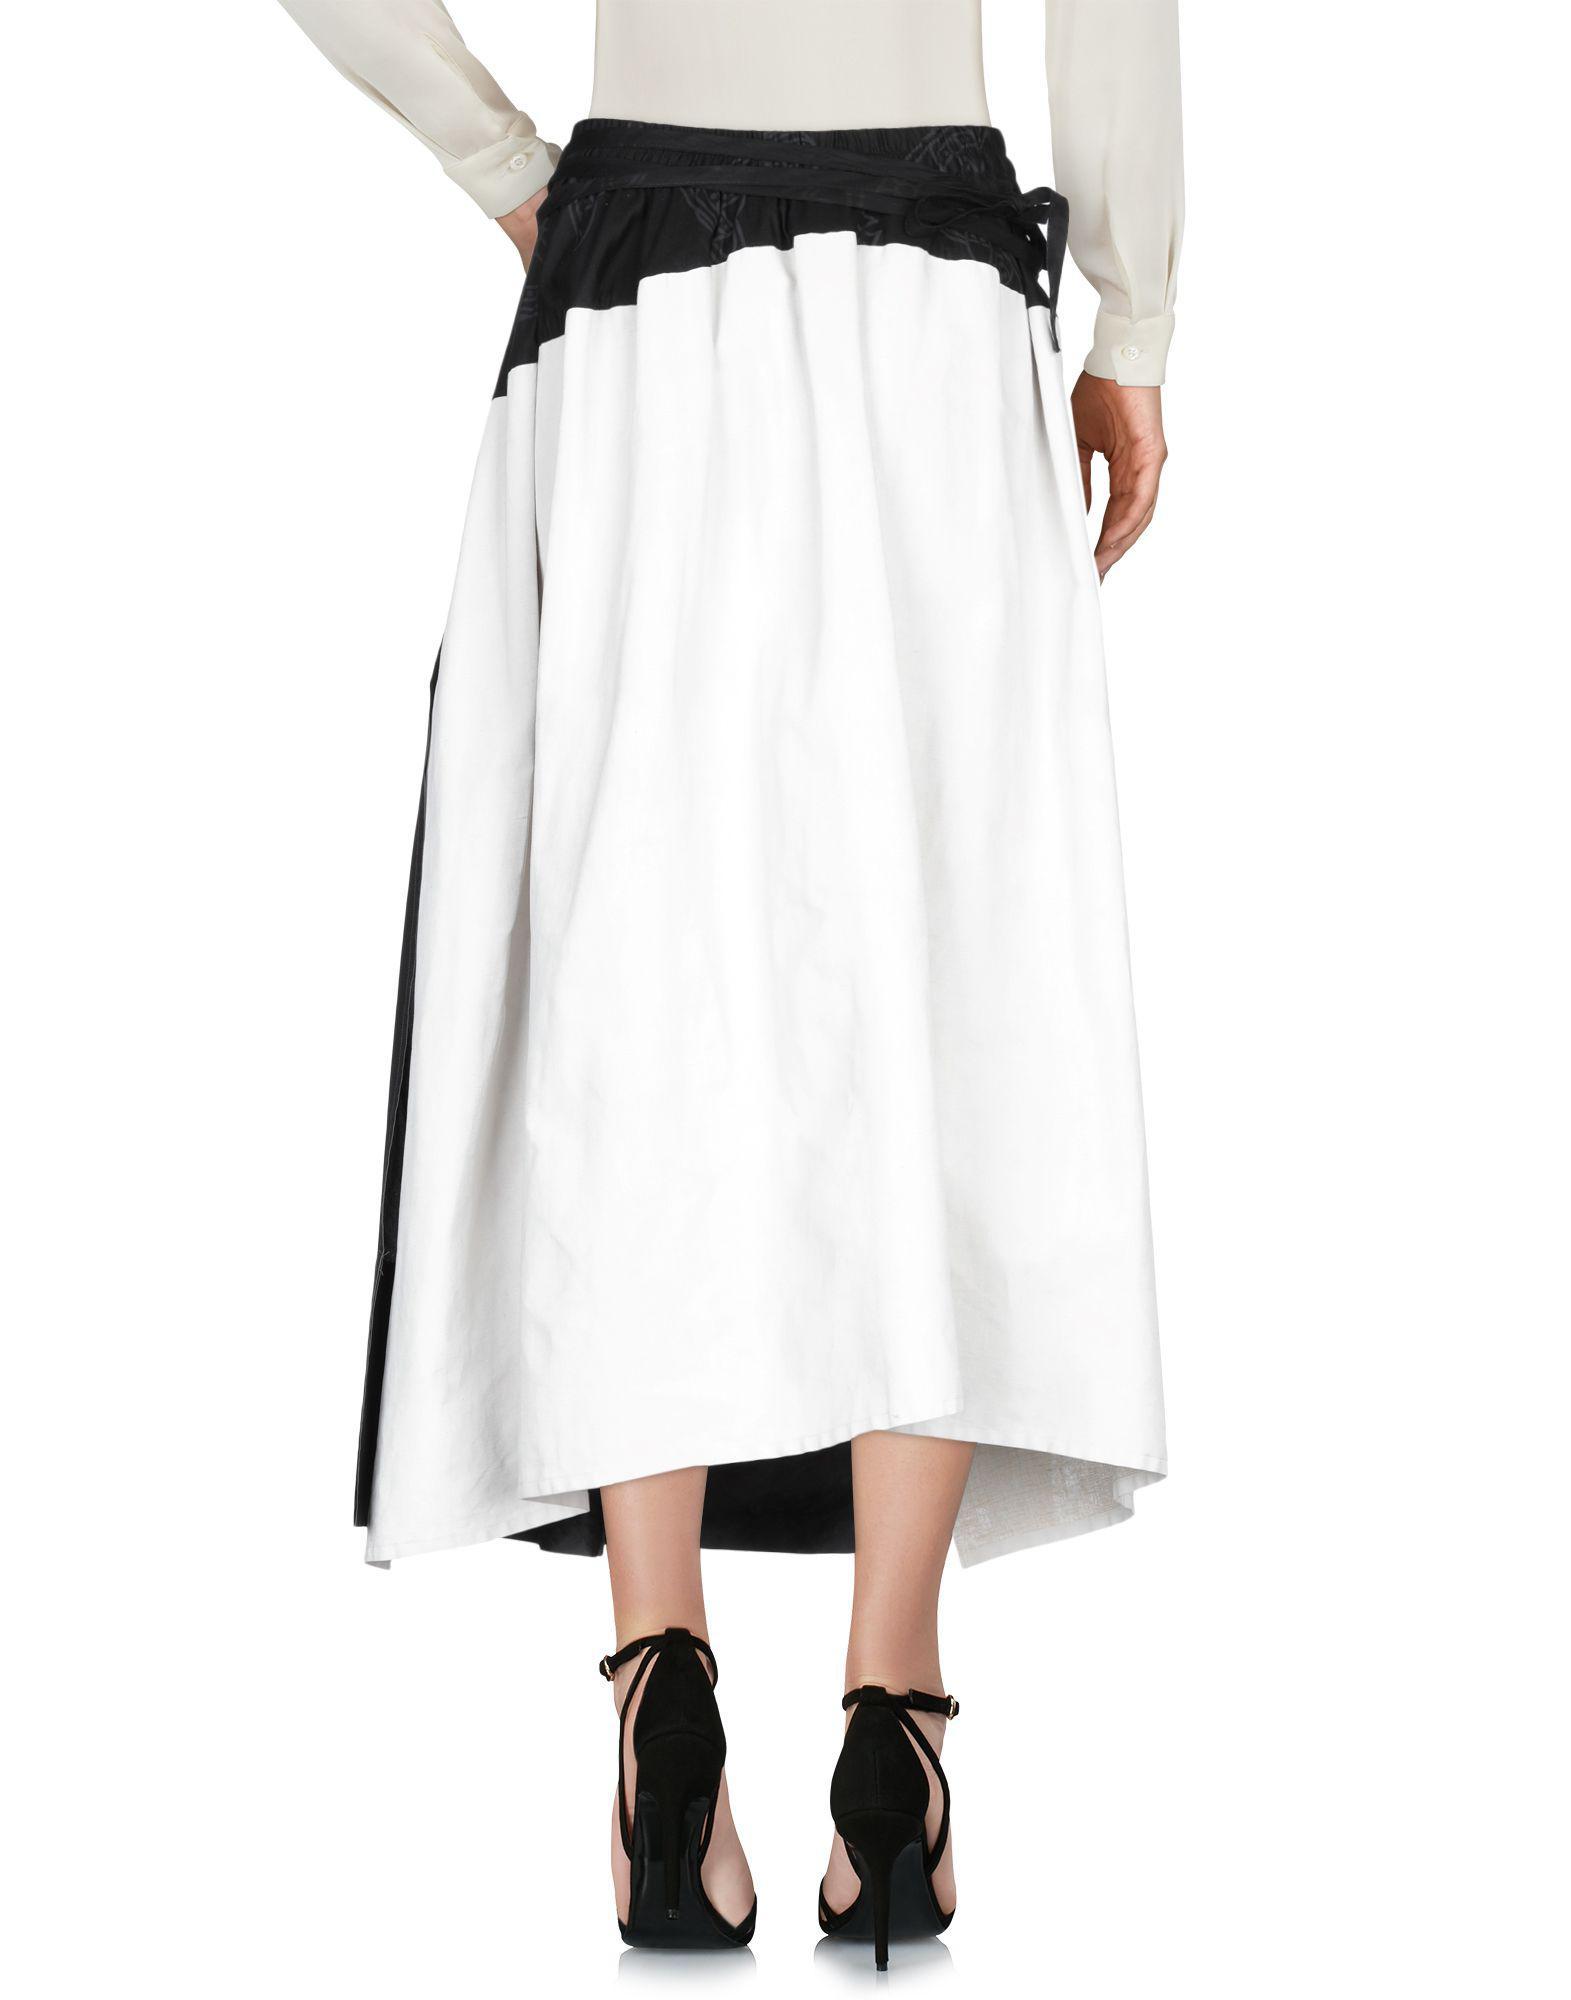 75842a528e Lyst - Vivienne Westwood Long Skirt in Black